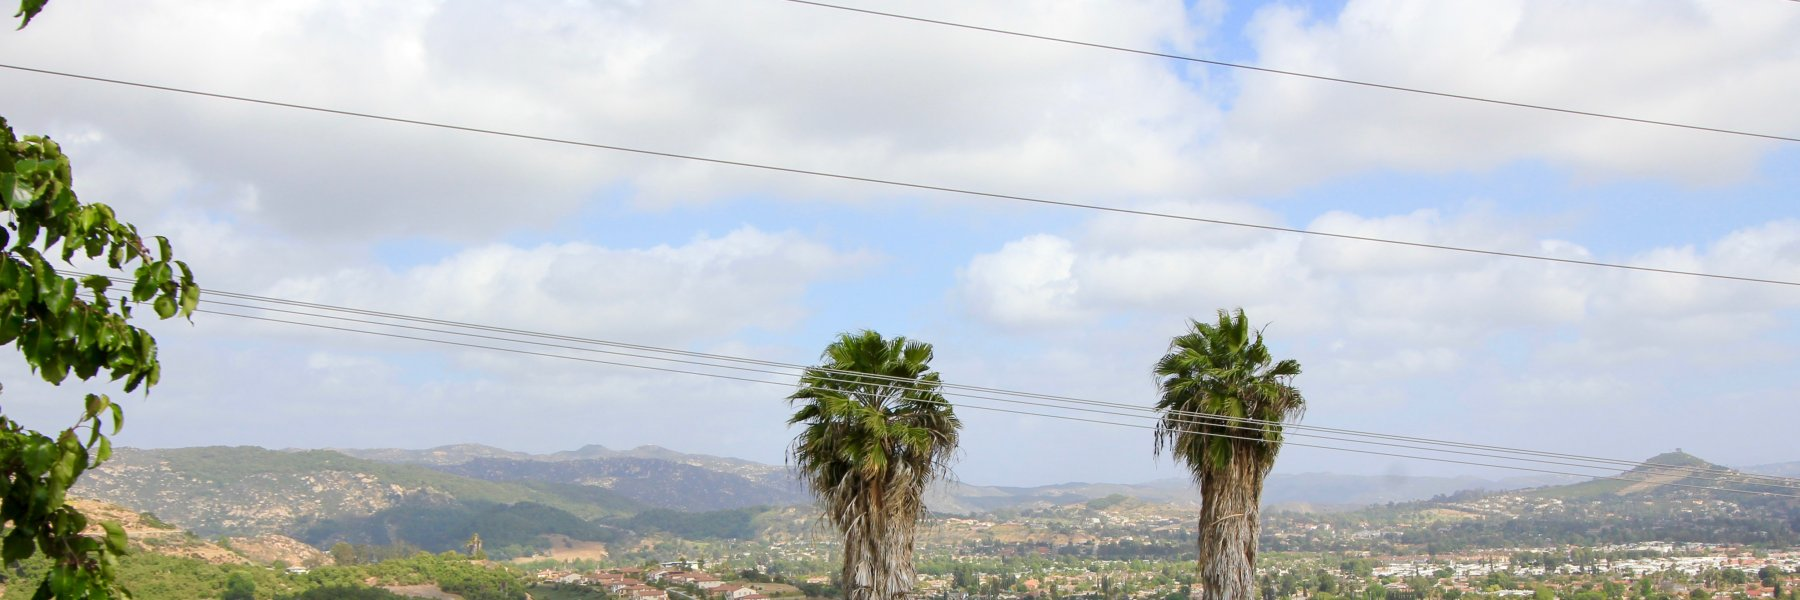 Cimarron is a community of homes in Escondido California